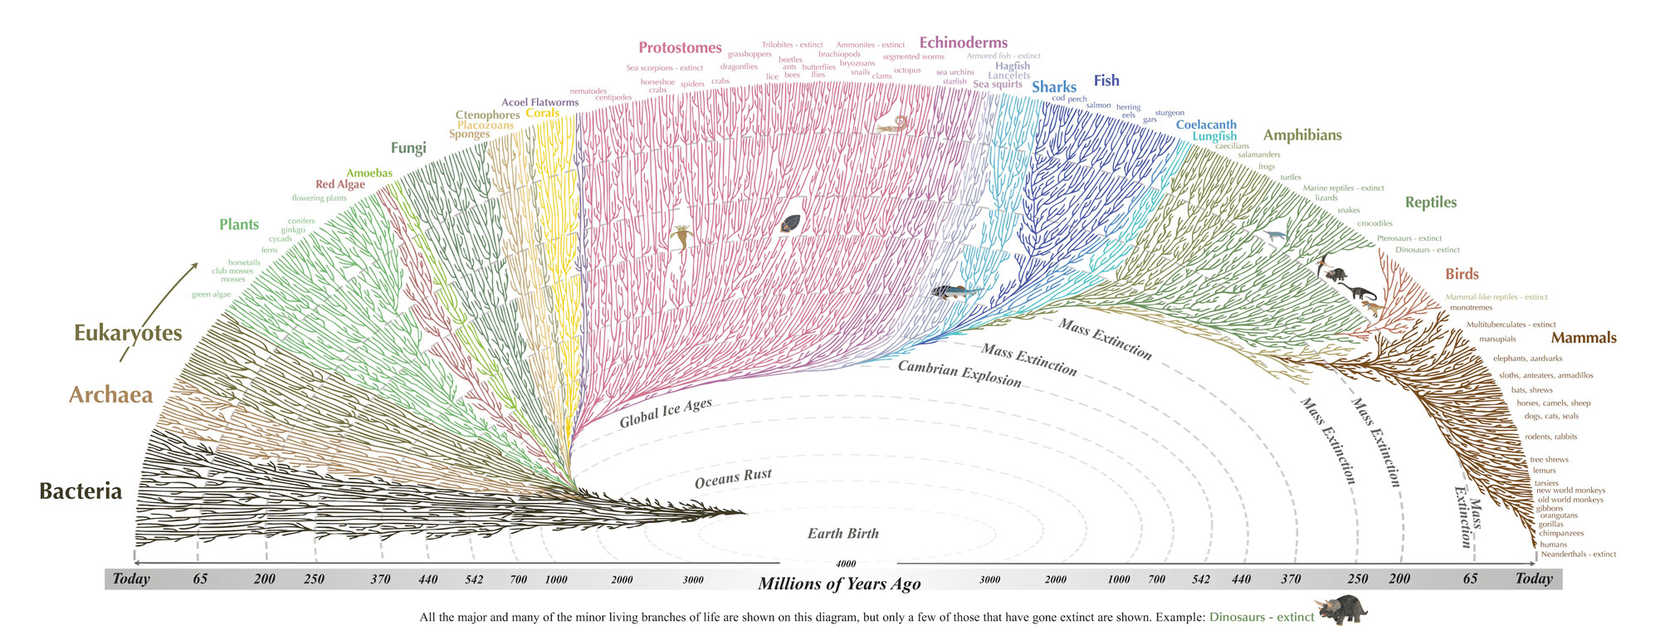 Tree of life 2000